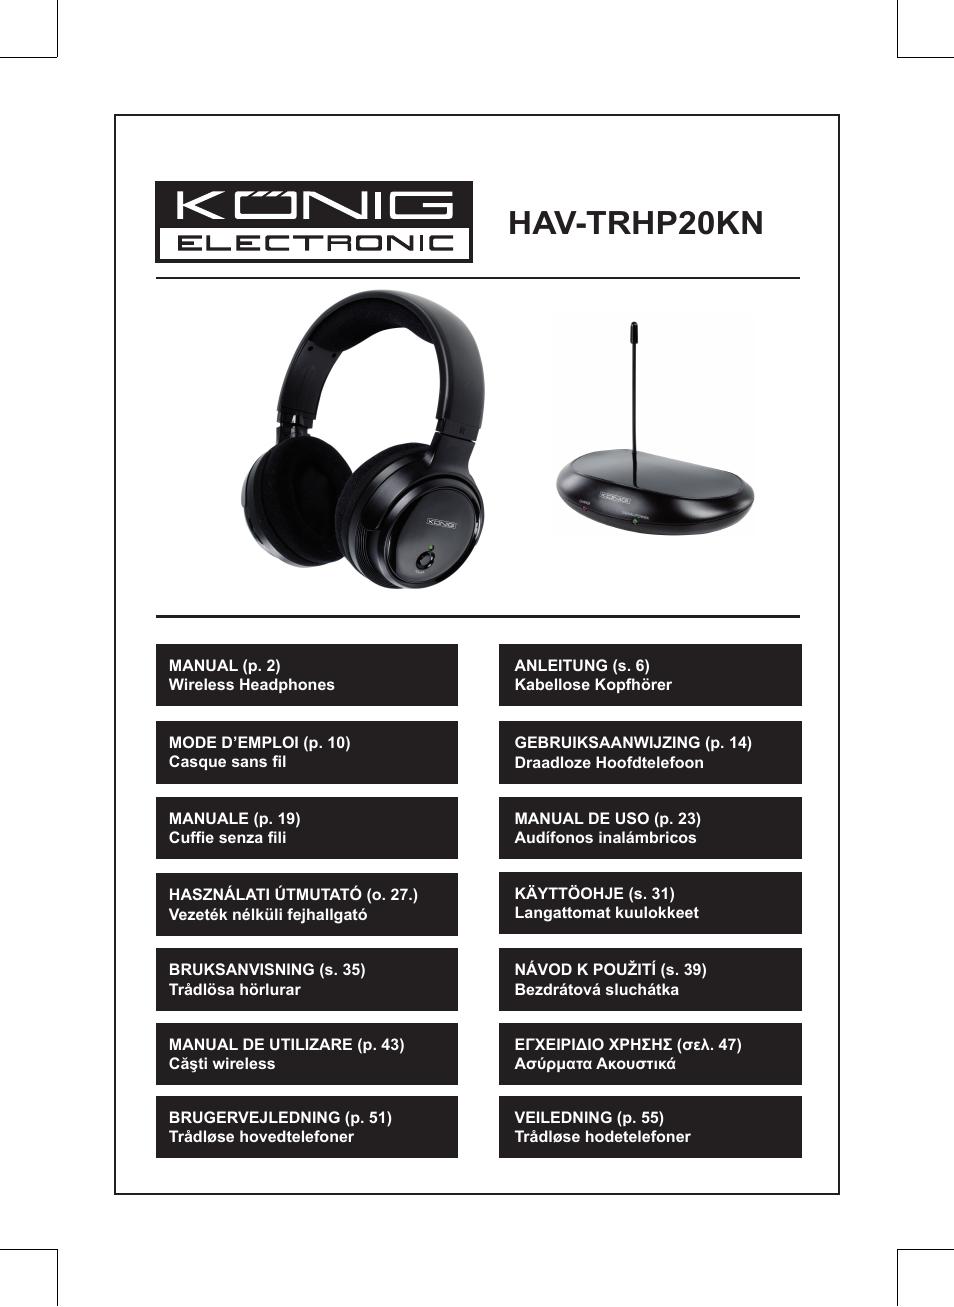 Konig Electronic Wireless headphones 863 Mhz User Manual  0fc49e7406